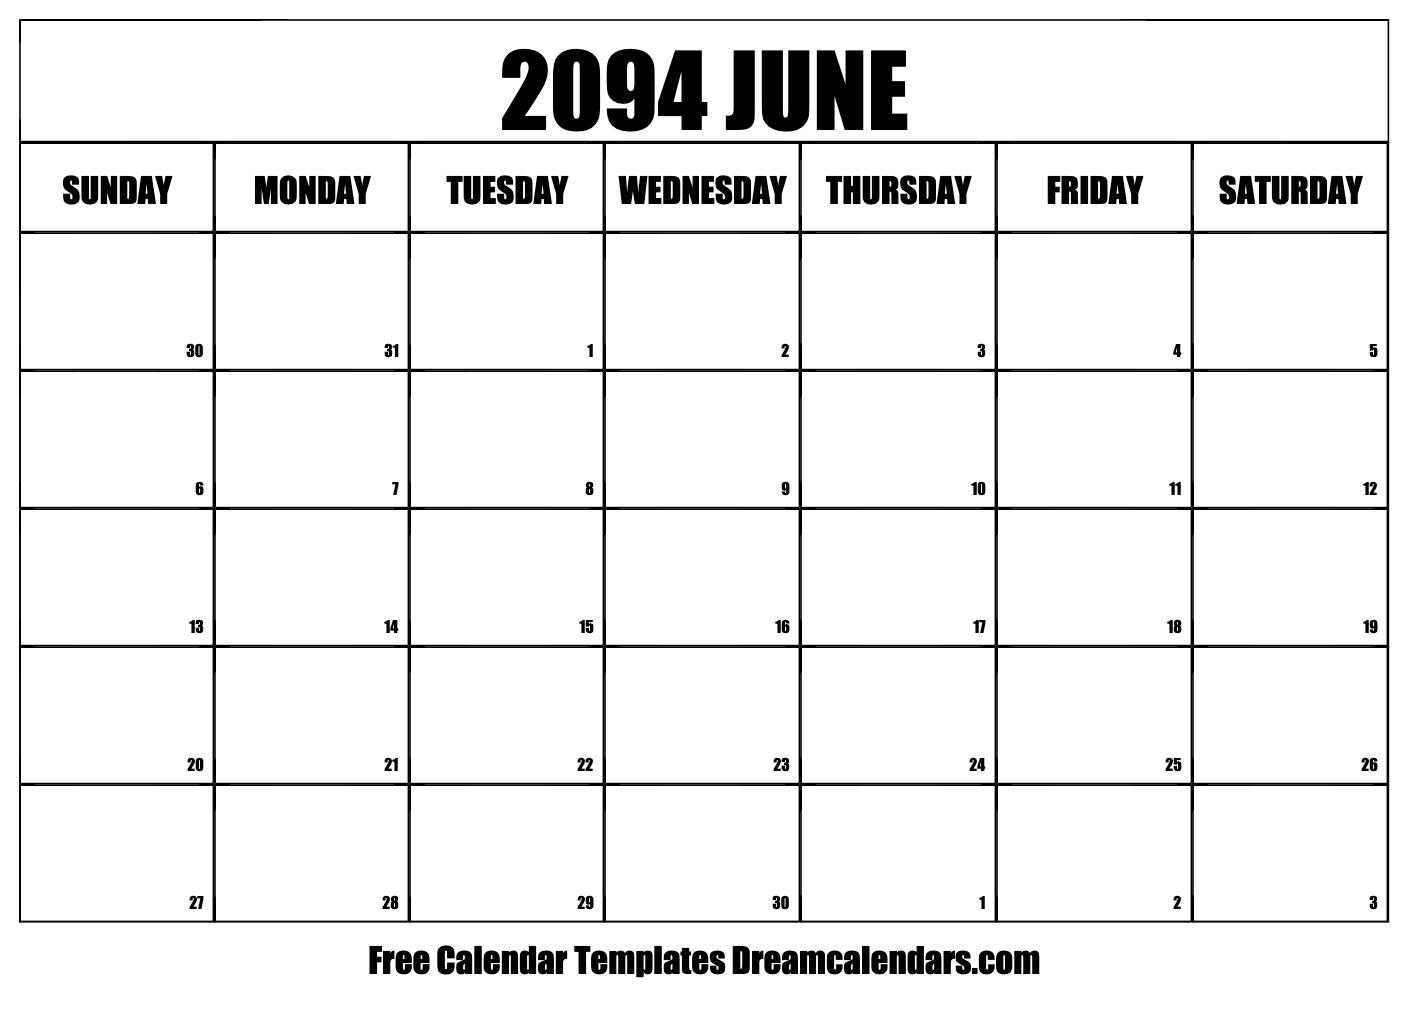 photograph about Free Printable June Calendar identify Printable June 2094 Calendar